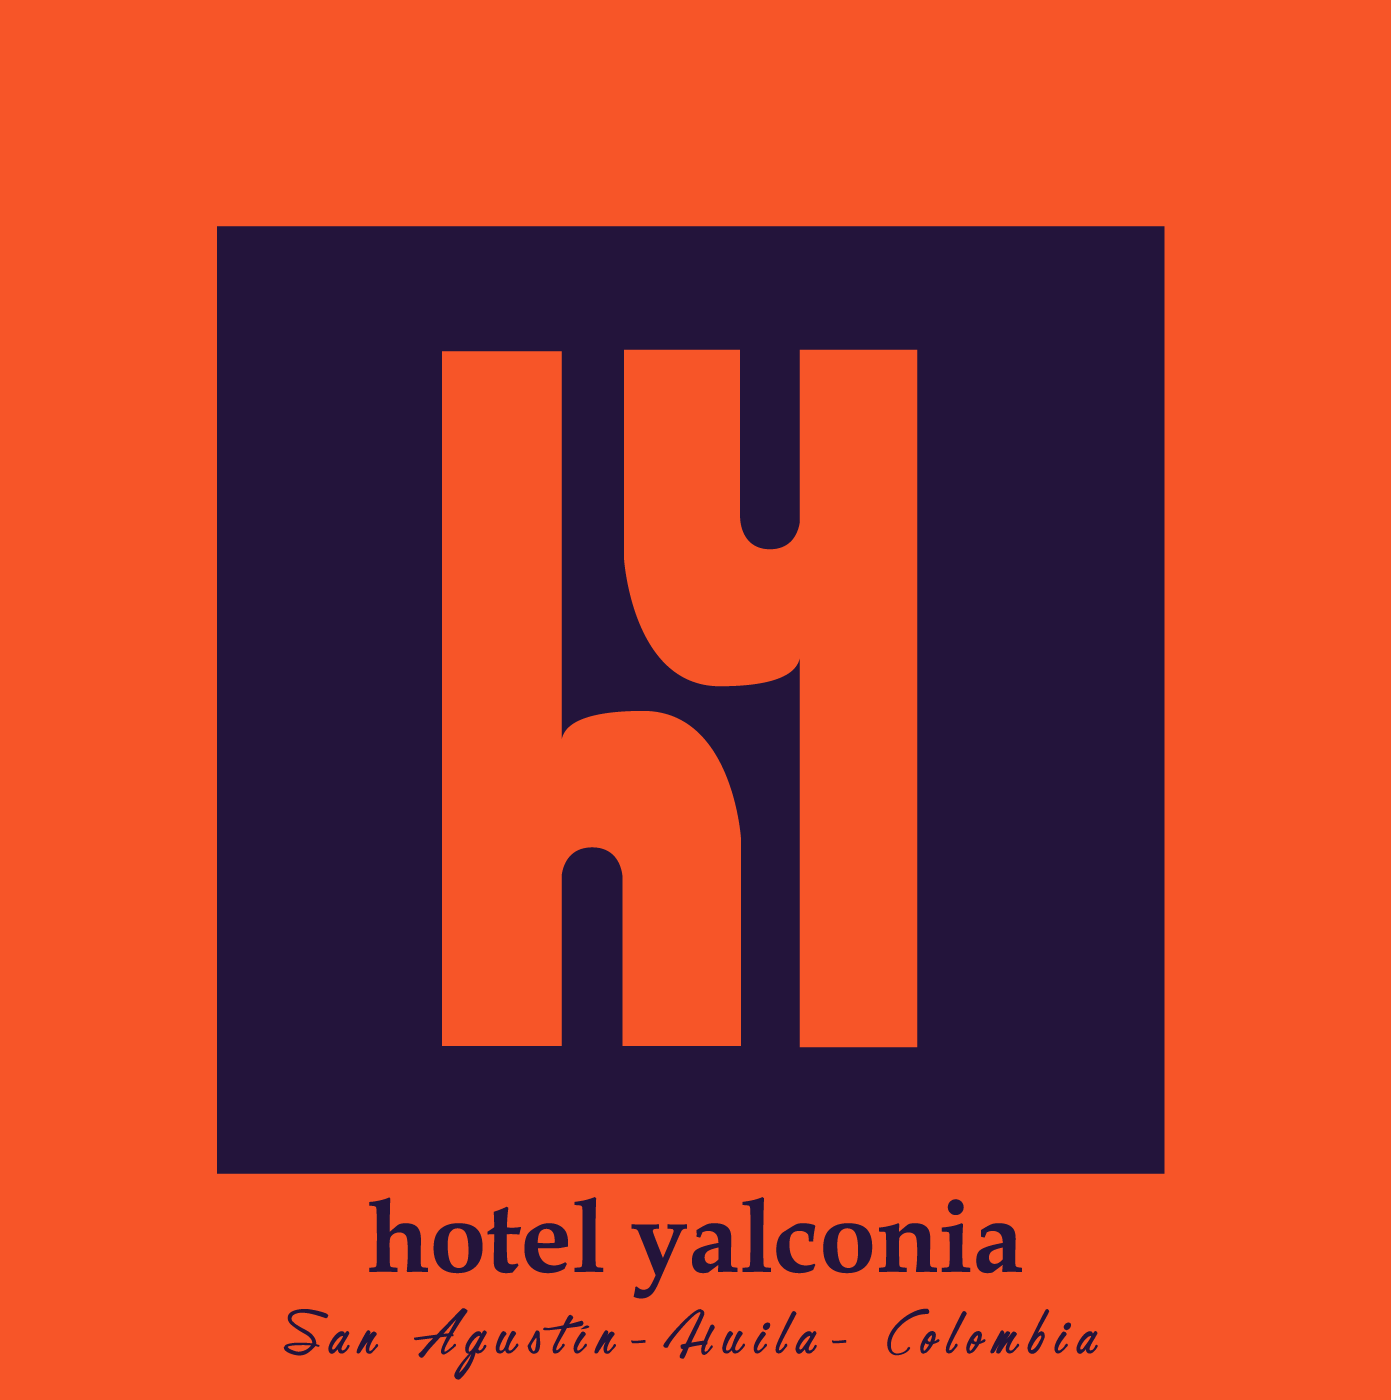 Hotel Yalconia